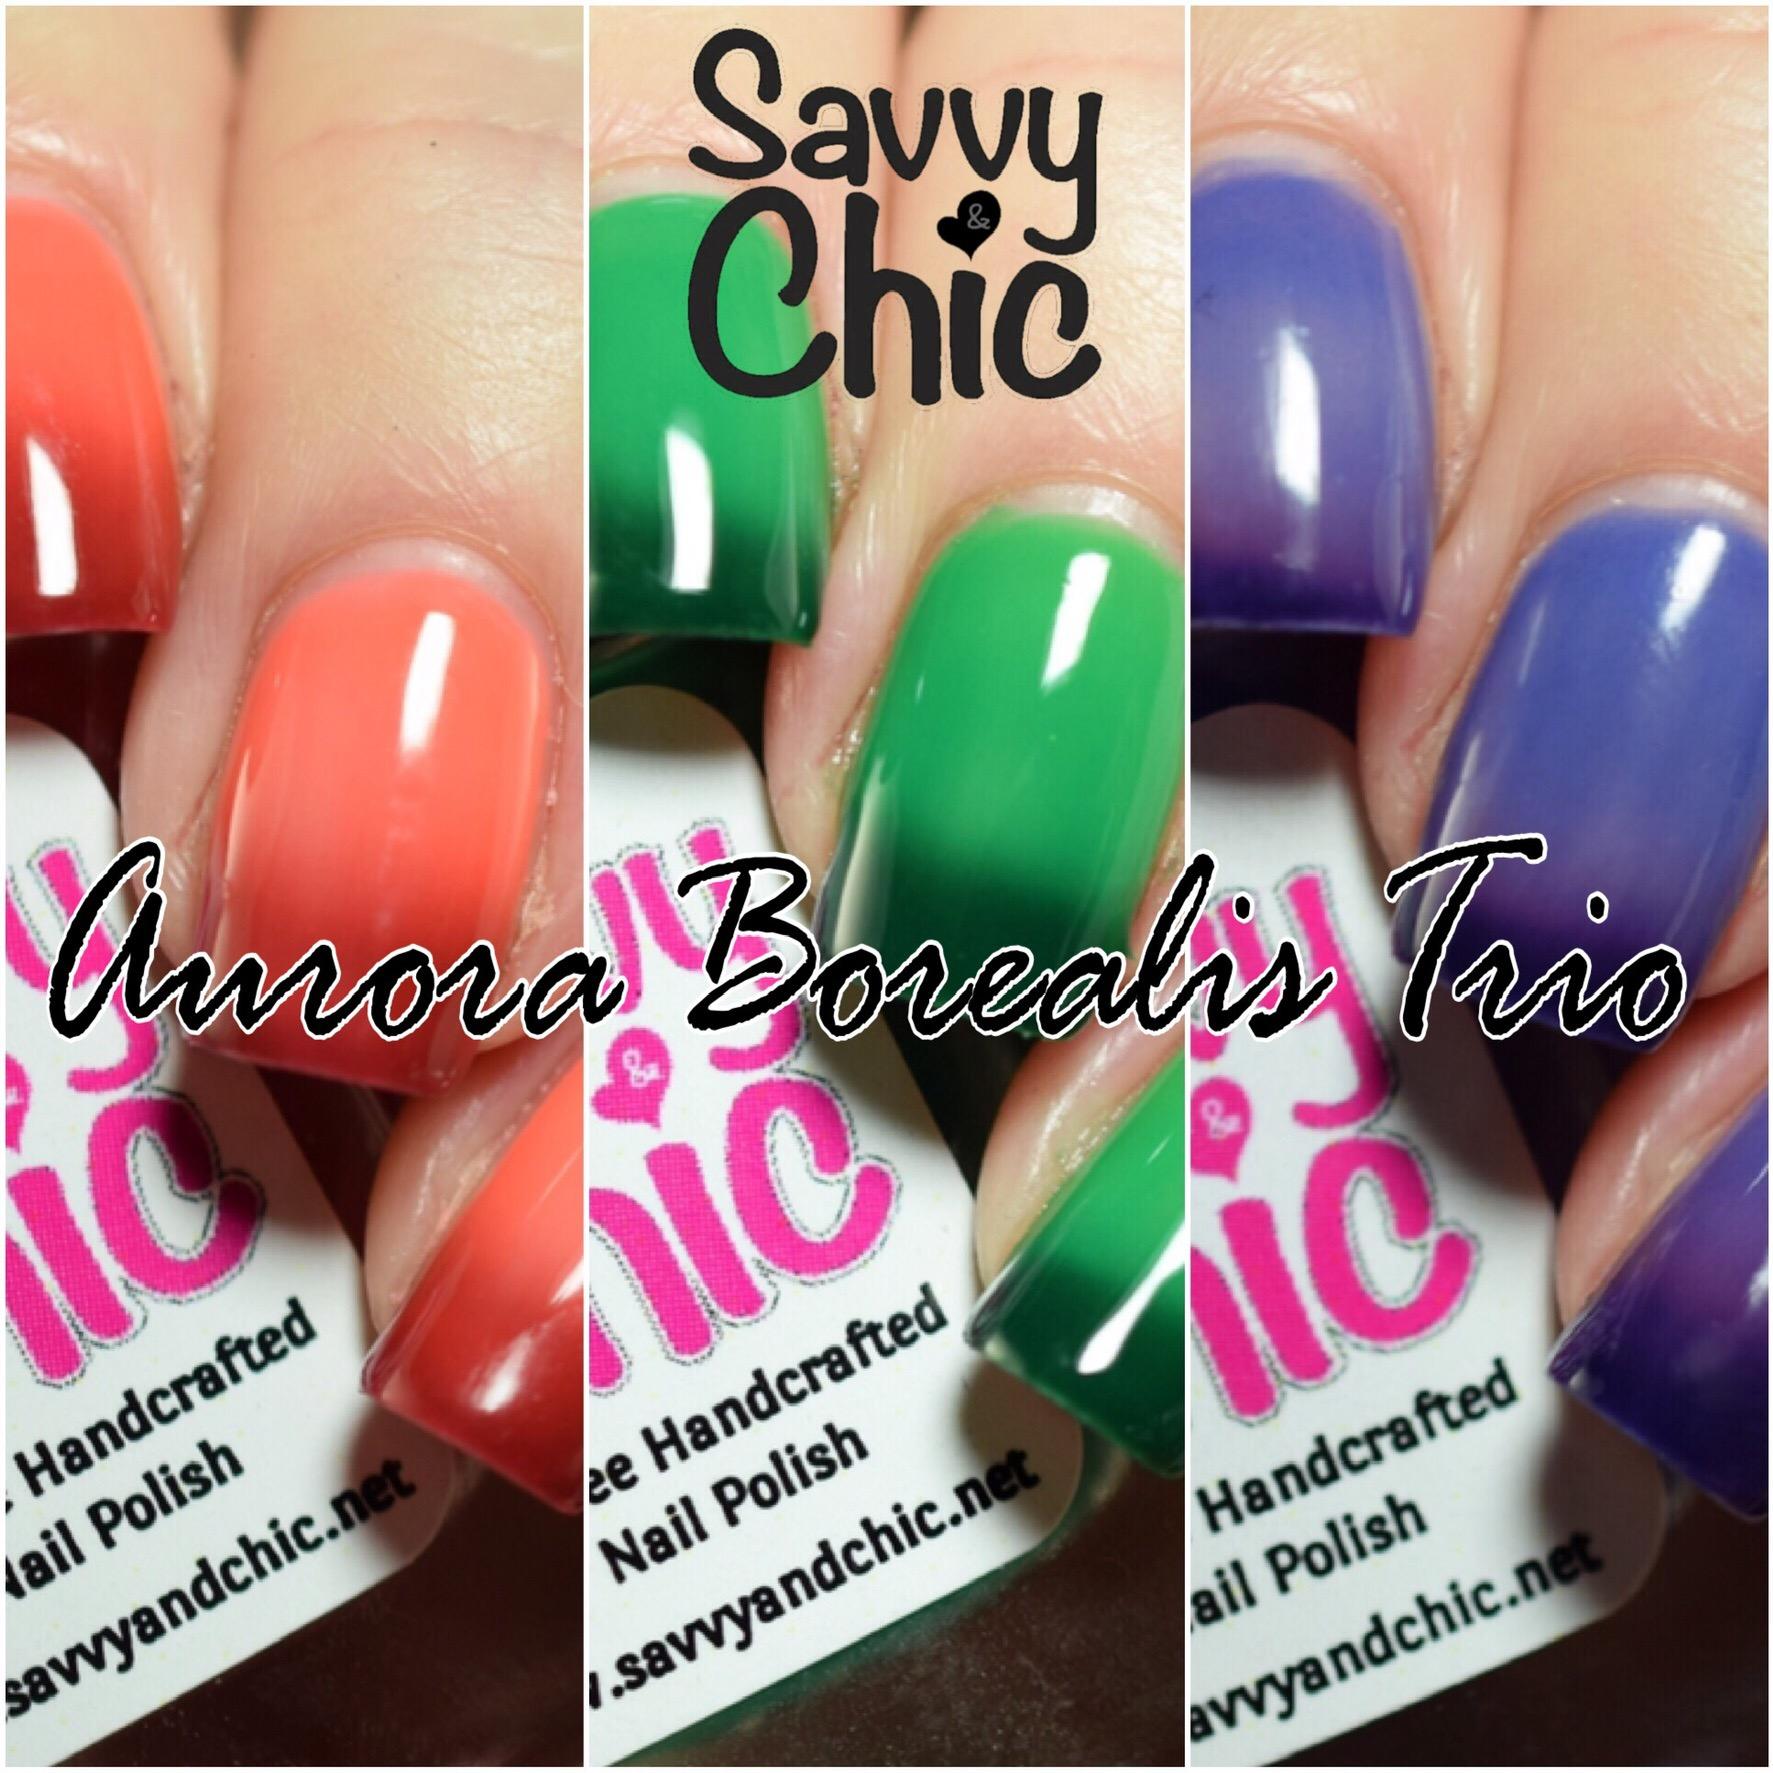 Savvy & Chic Aurora Borealis Trio